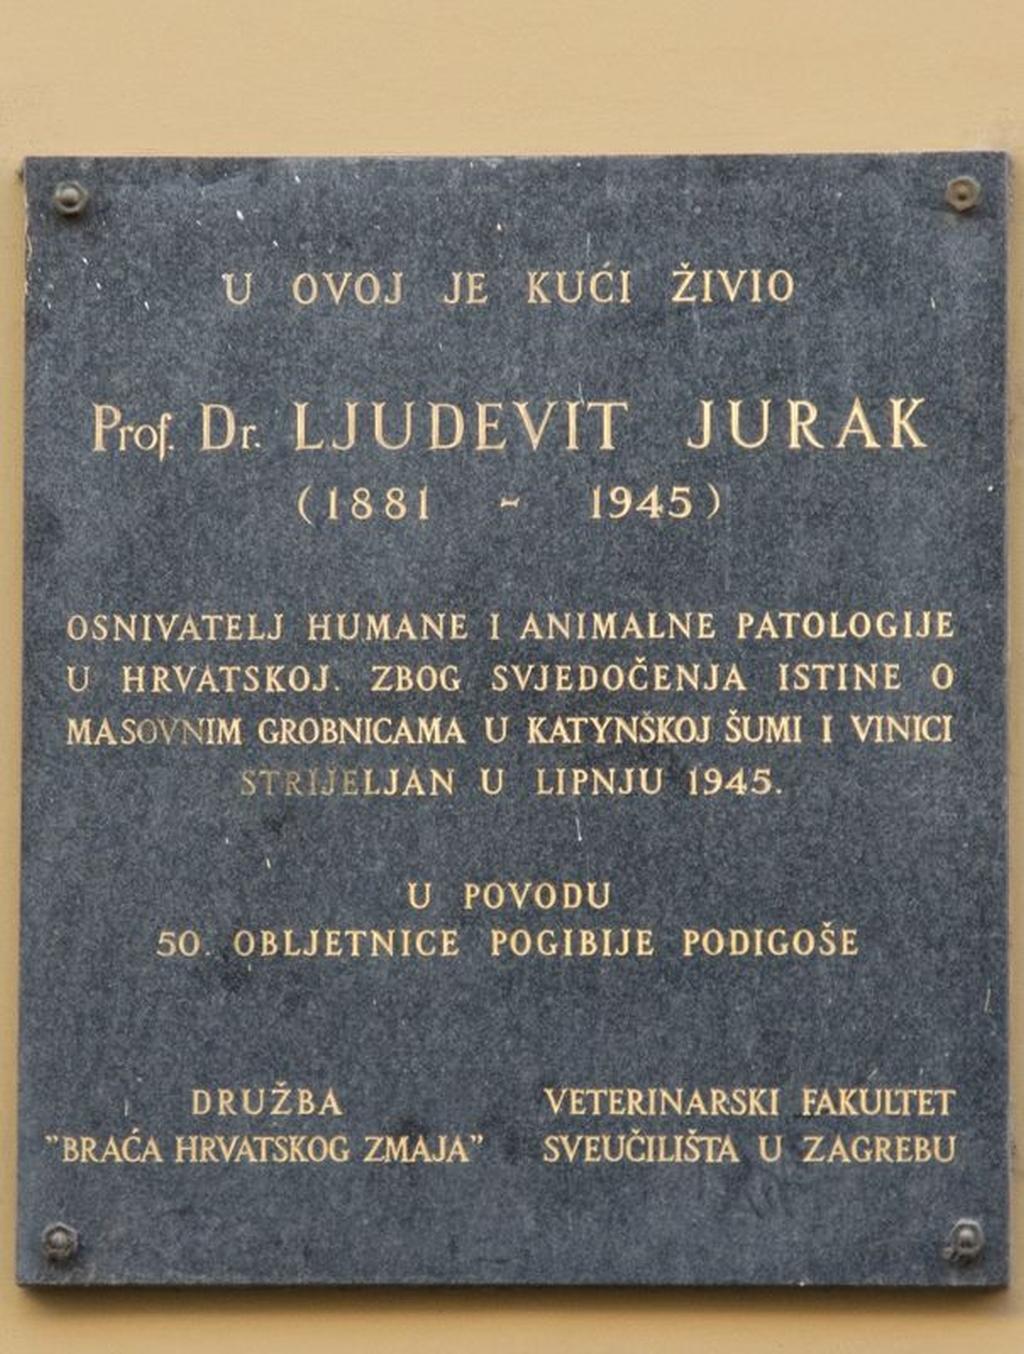 Spomen_ploca_Ljudevit_Jurak_Zagreb_01052012_roberta_f